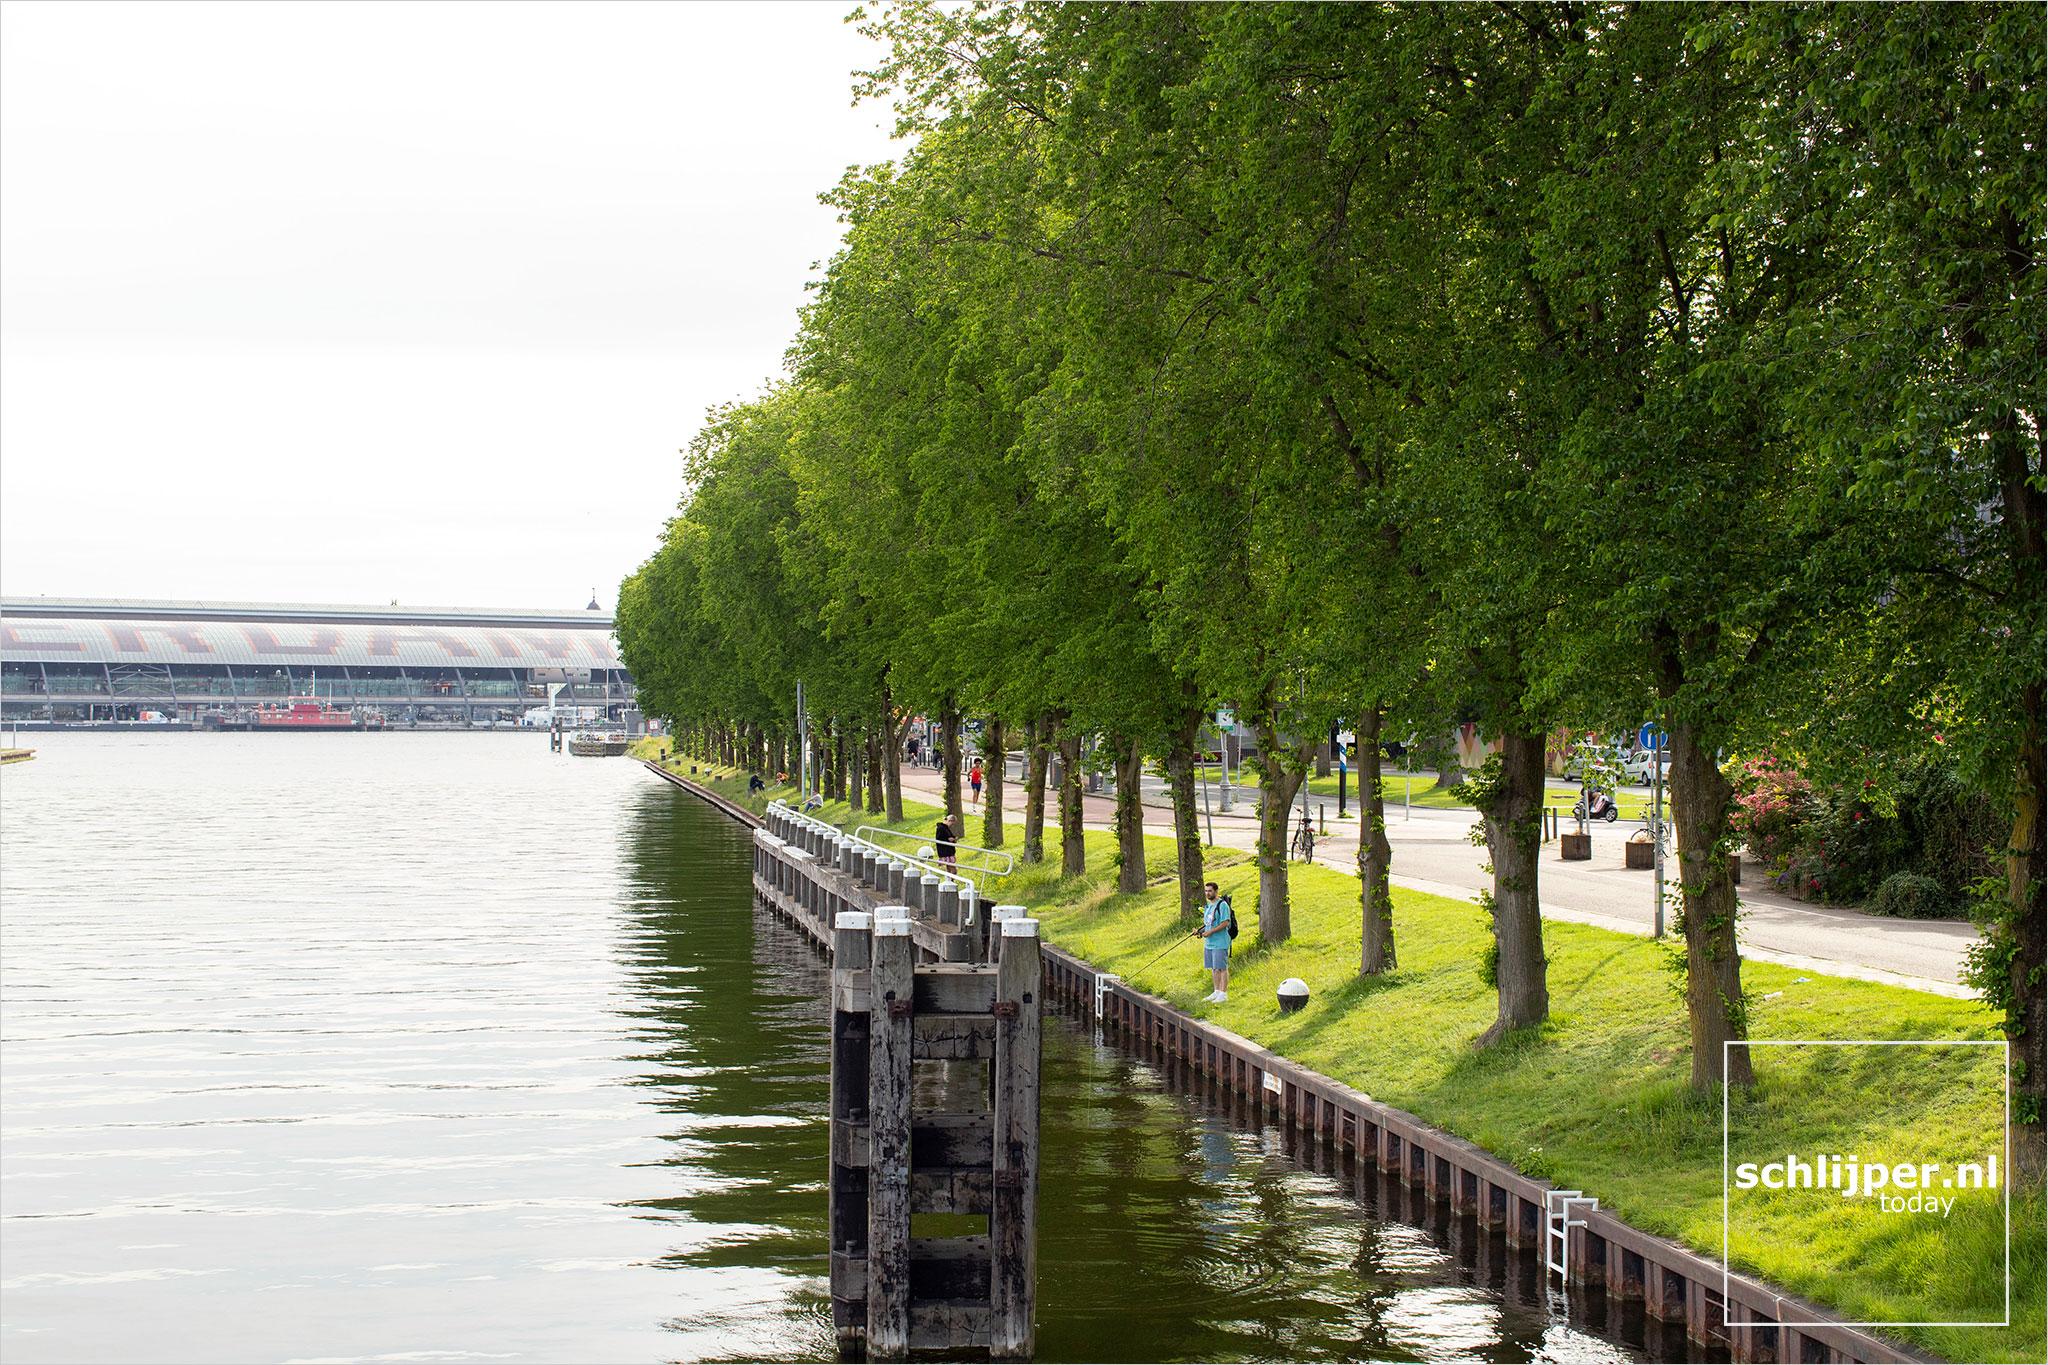 Nederland, Amsterdam, 15 juni 2020